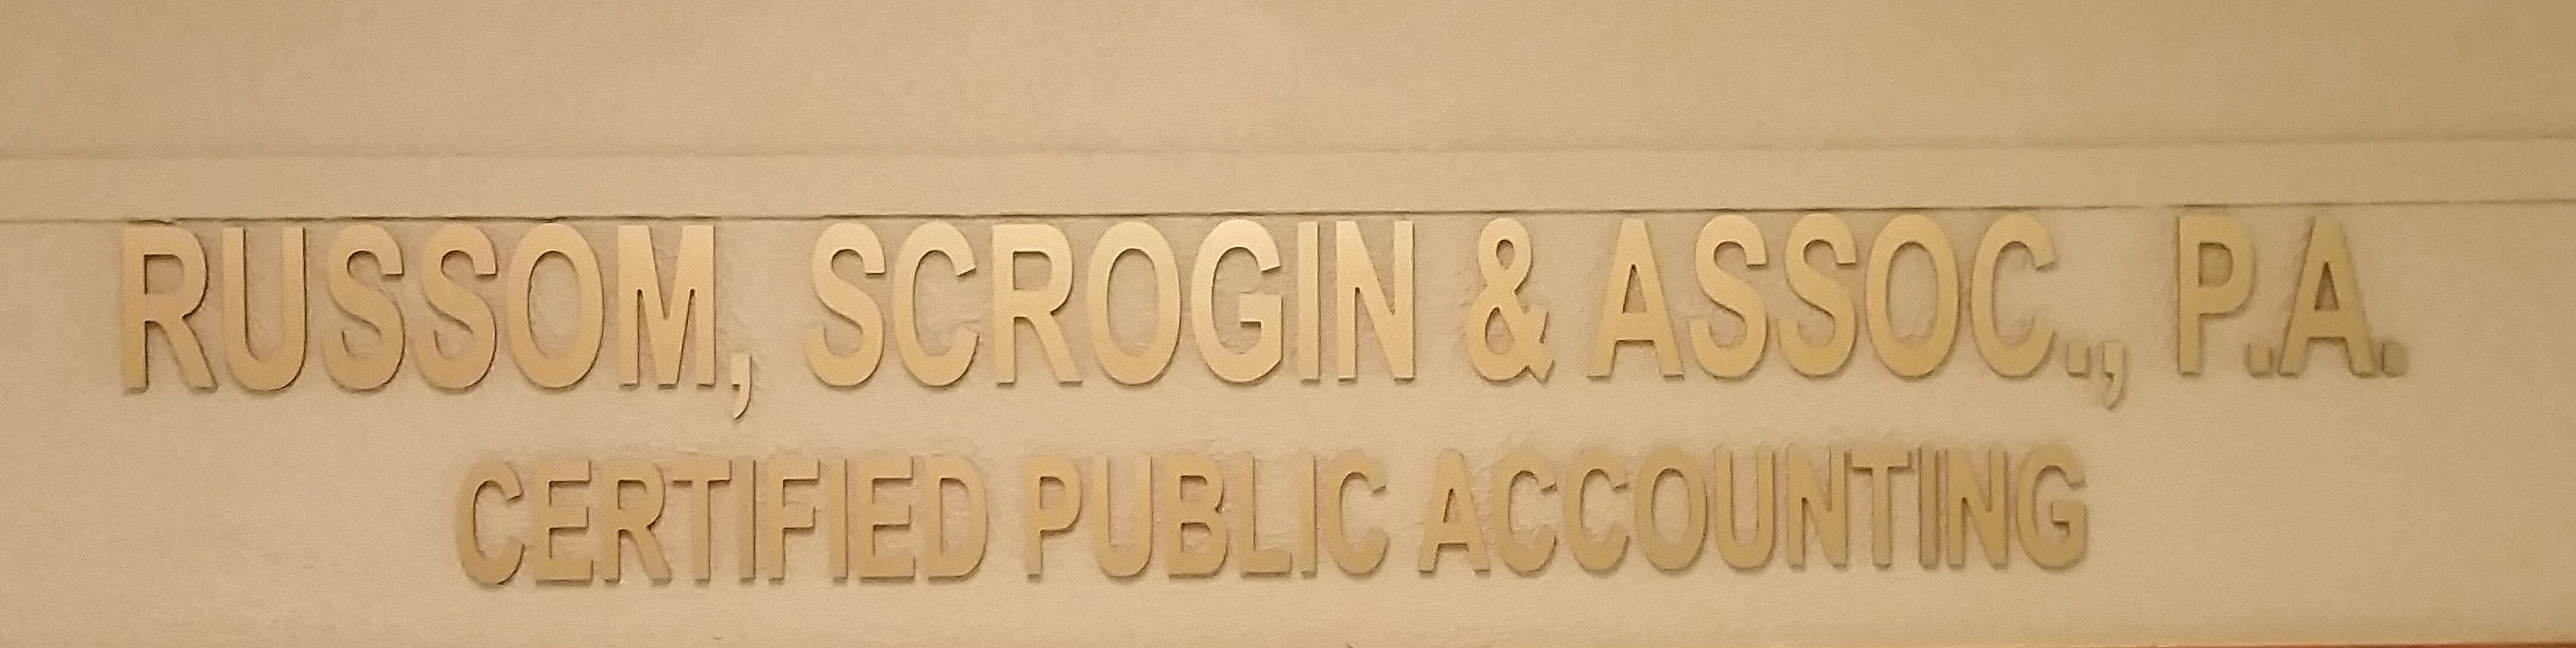 Russom, Scrogin & Associates, P.a.